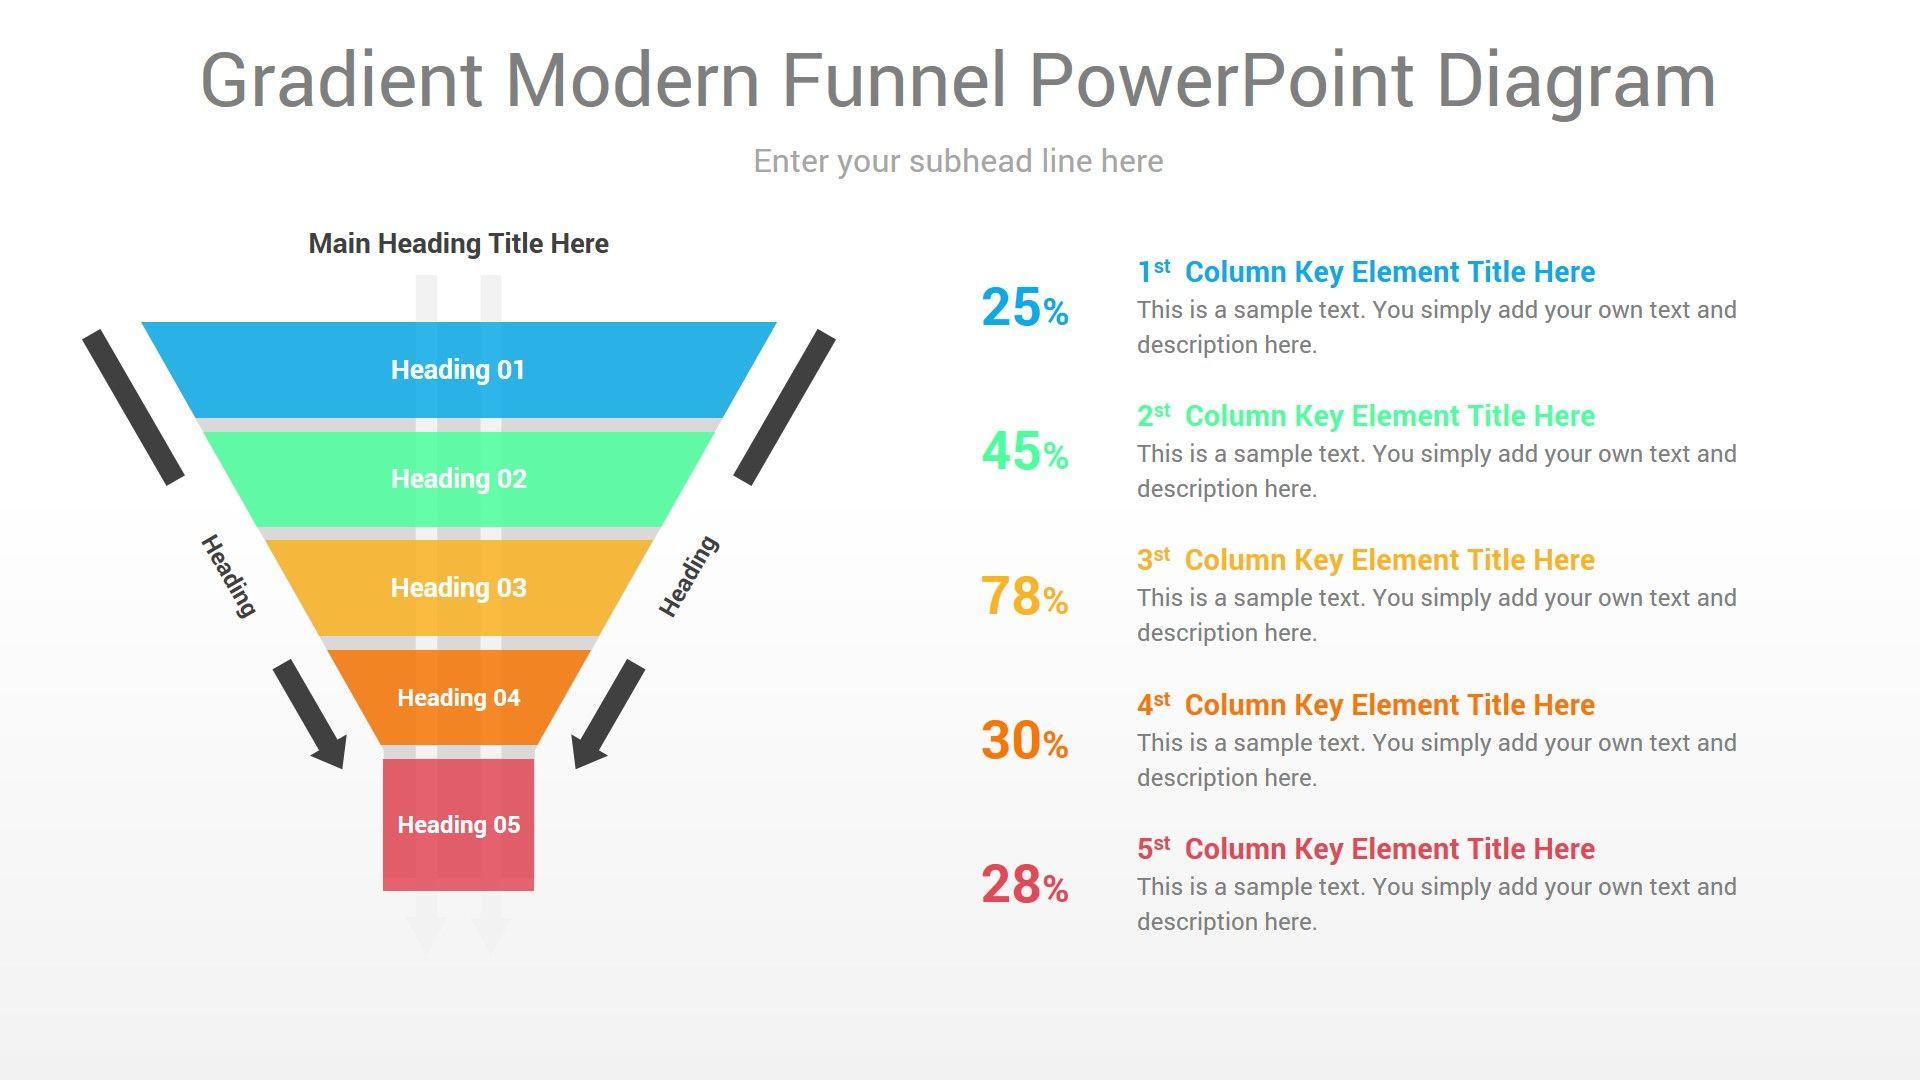 Gradient Modern Funnel Powerpoint Diagram In 2020 Powerpoint Infographic Diagram